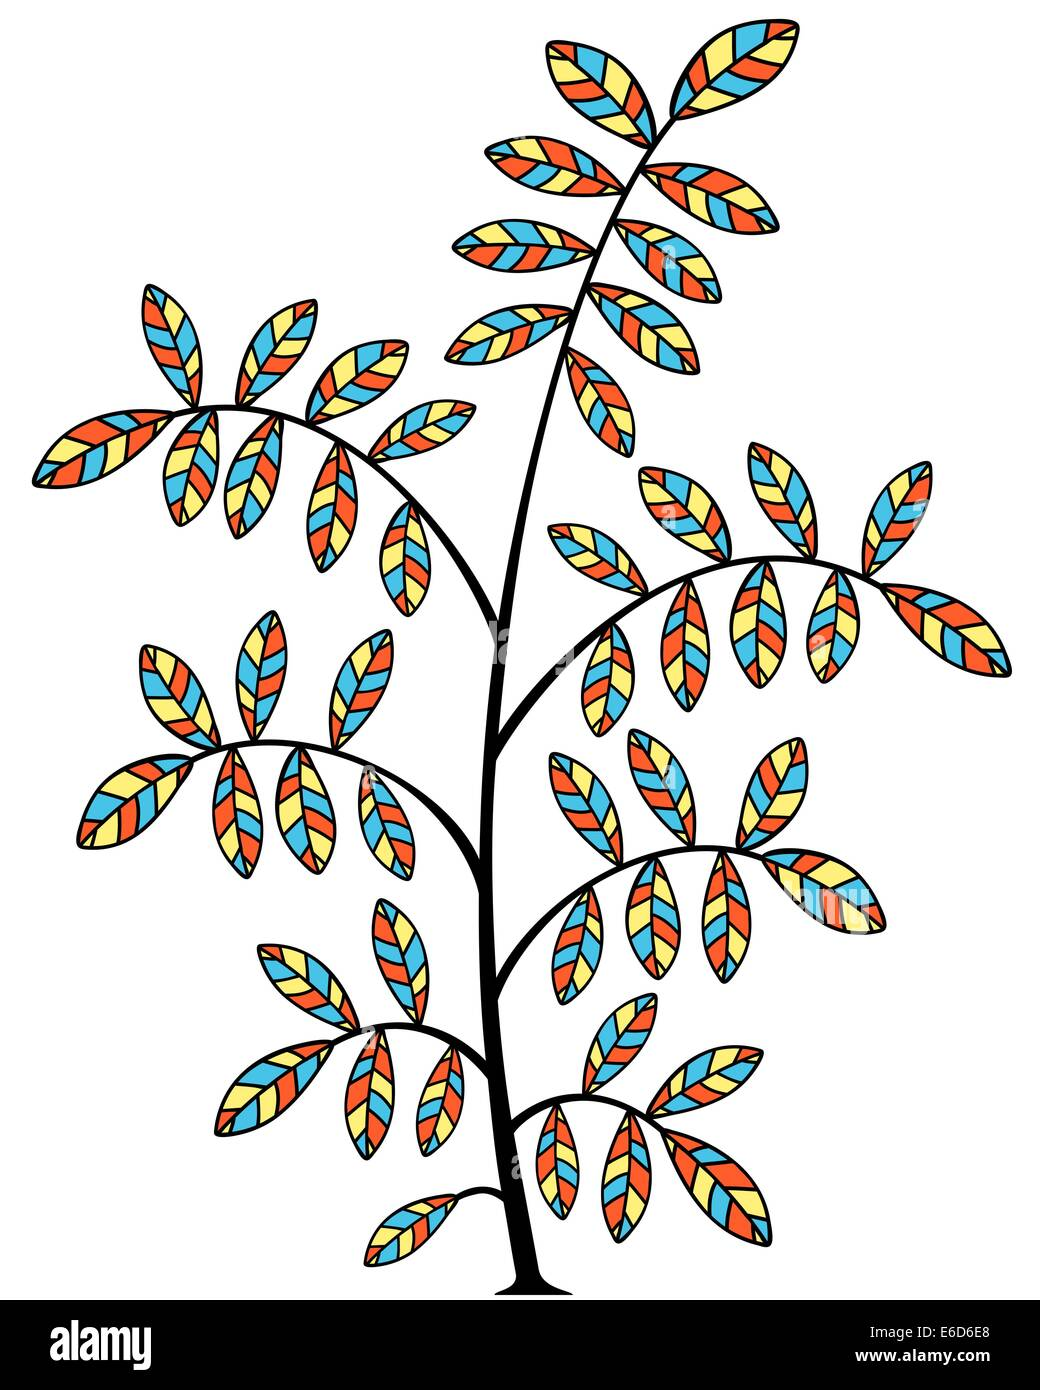 Editable vector illustration of a small tree - Stock Vector